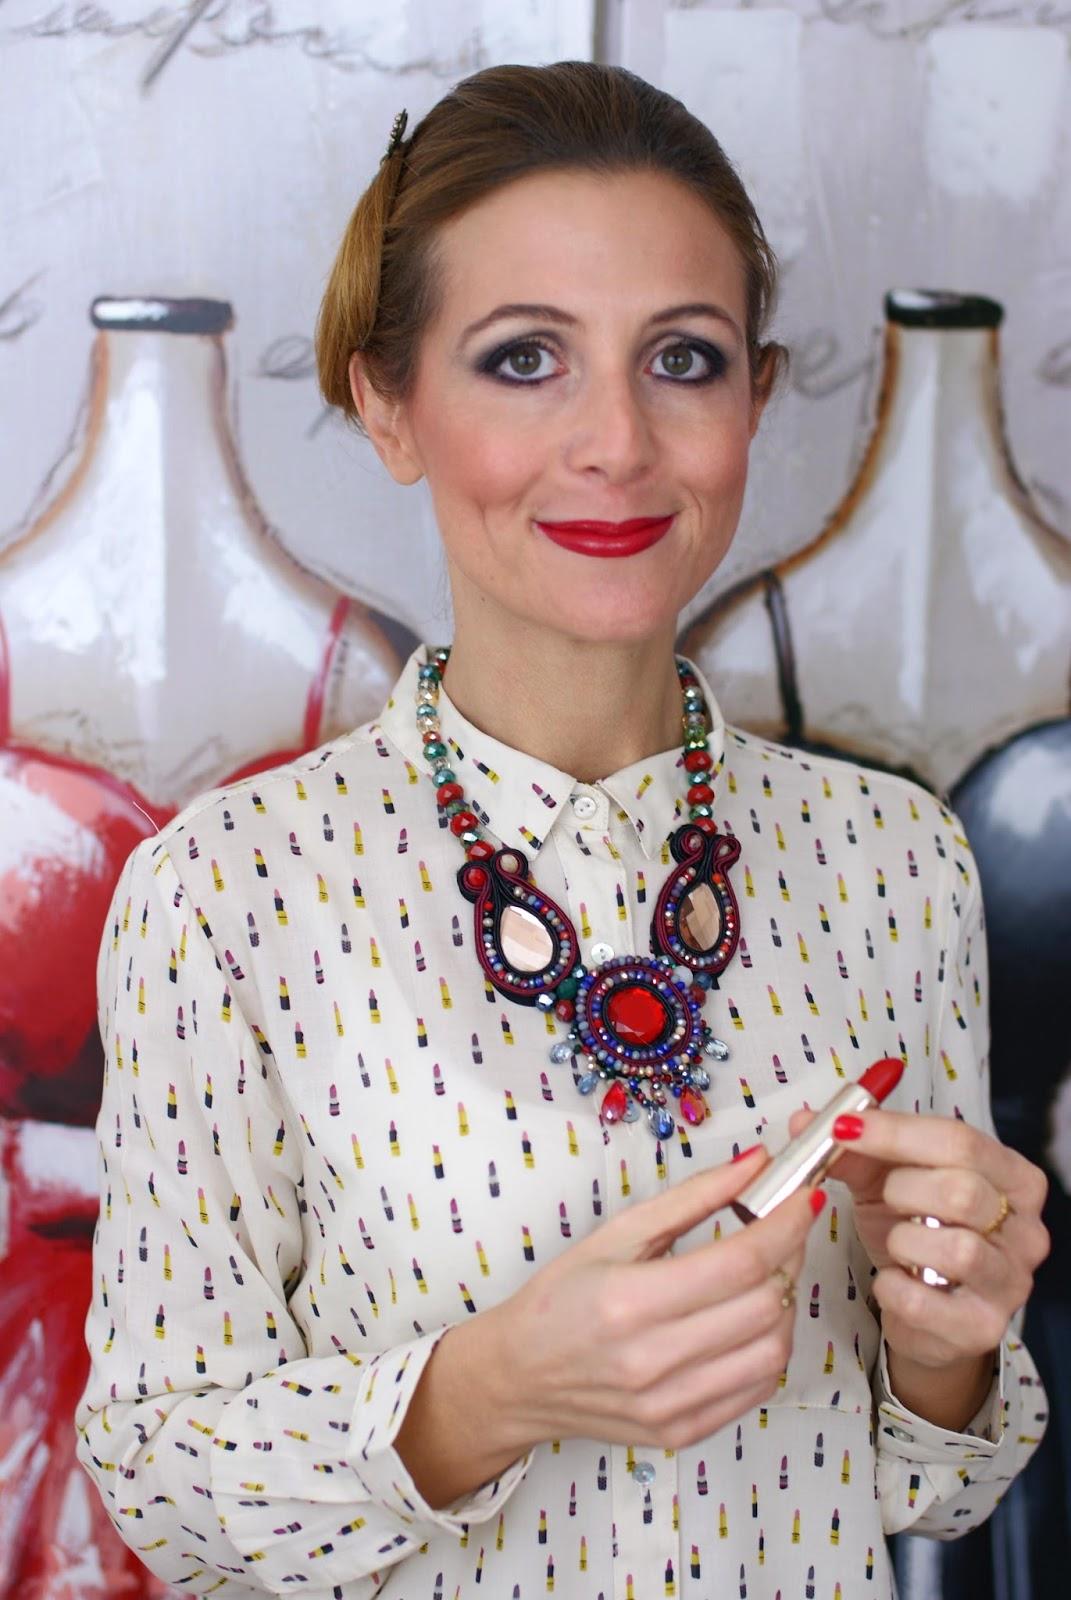 Clarins Joli Rouge lipstick review c7065c3908b